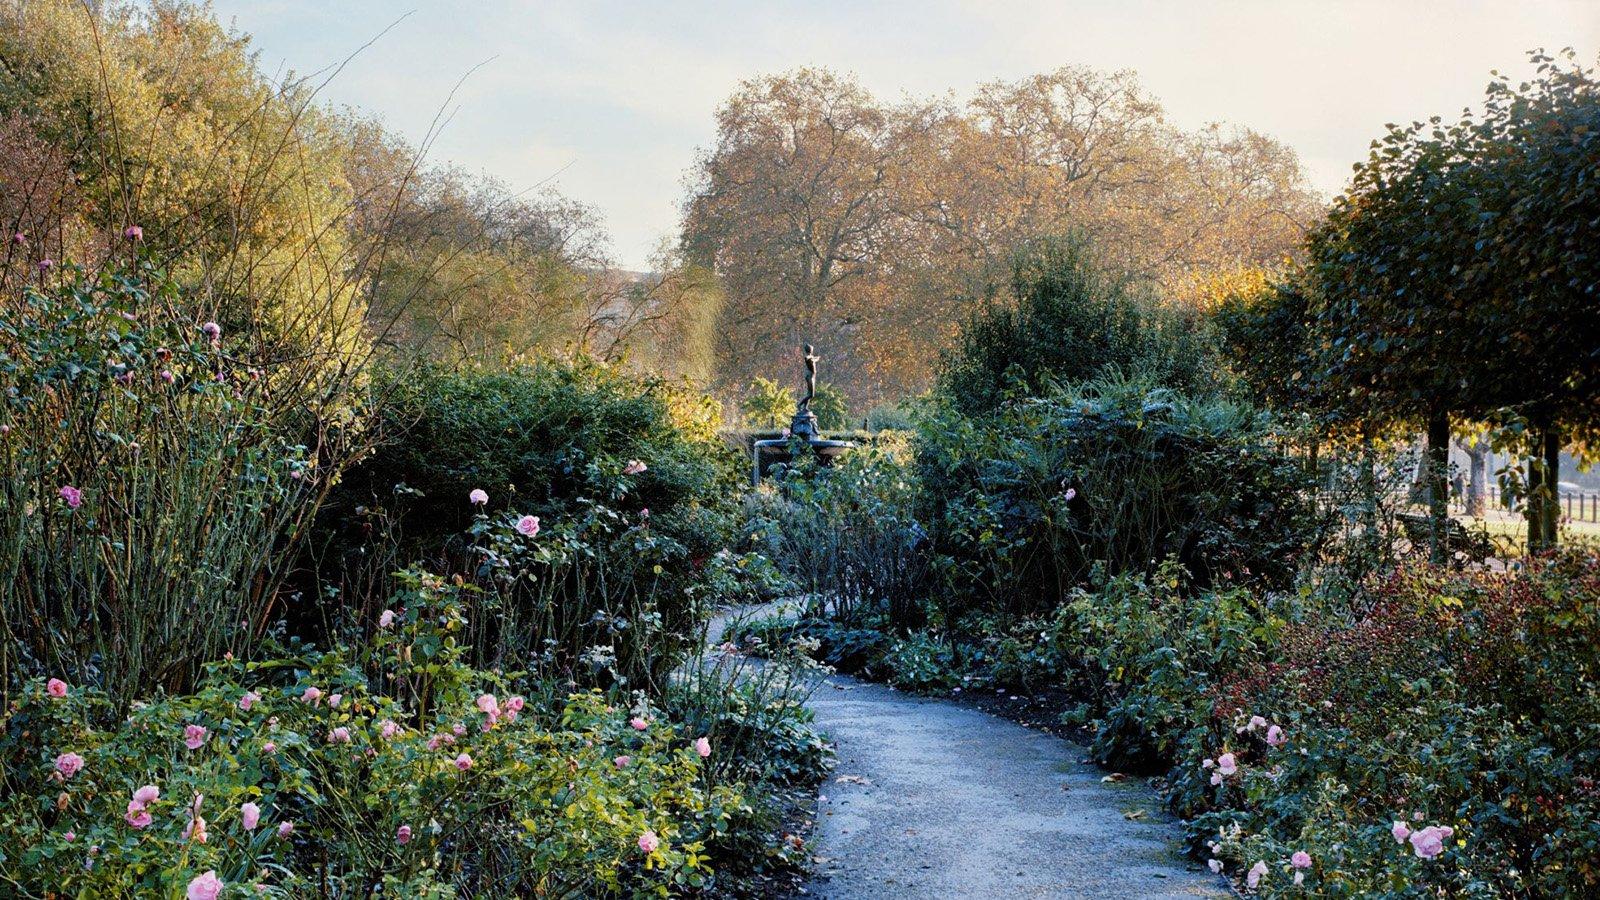 The Rose Garden at Hyde Park